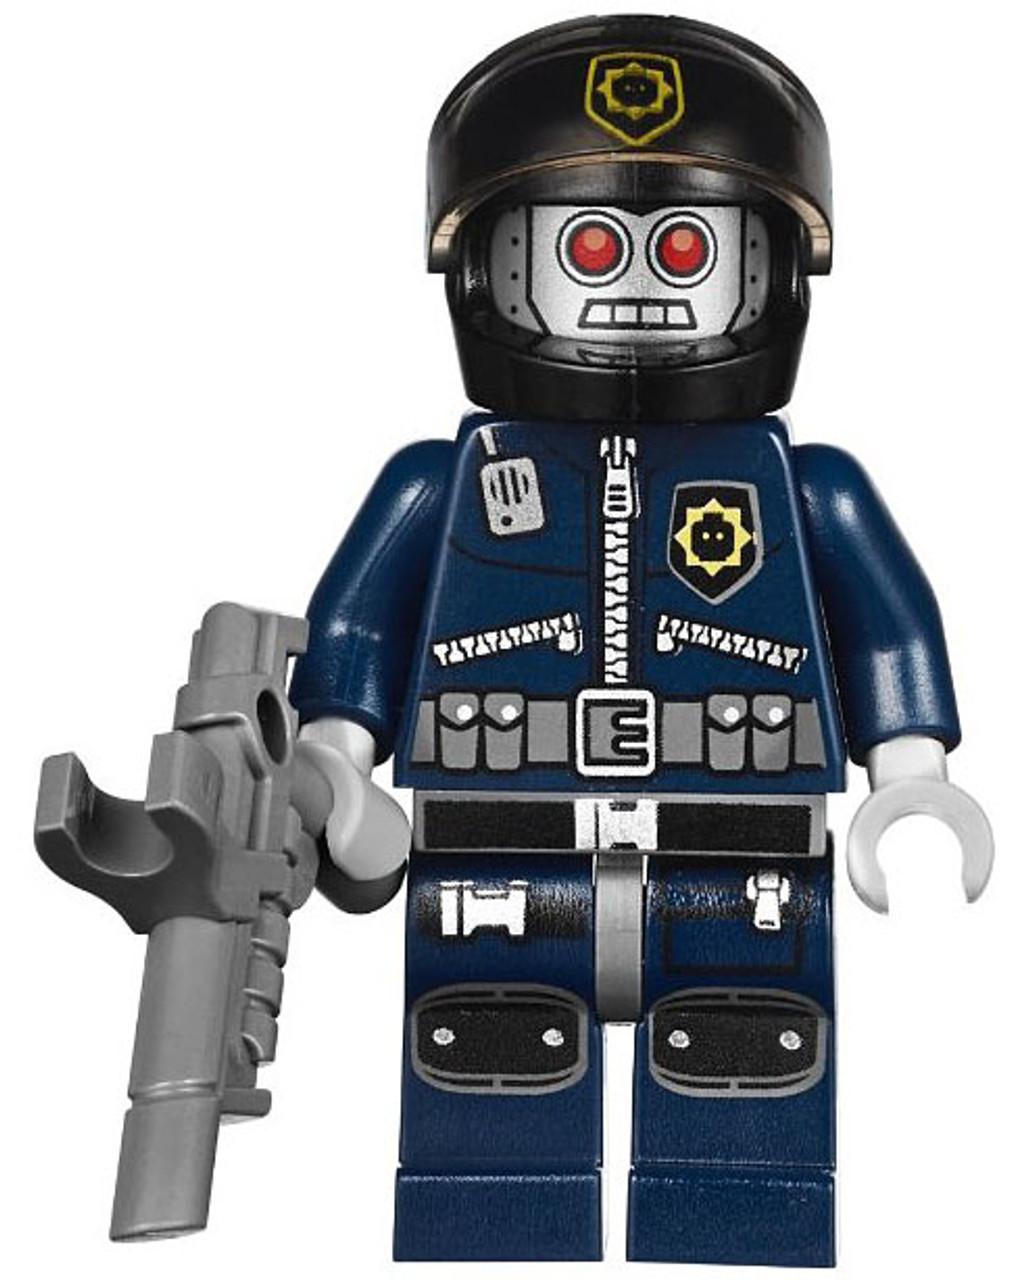 The LEGO Movie Loose Robo SWAT Minifigure [Helmet]